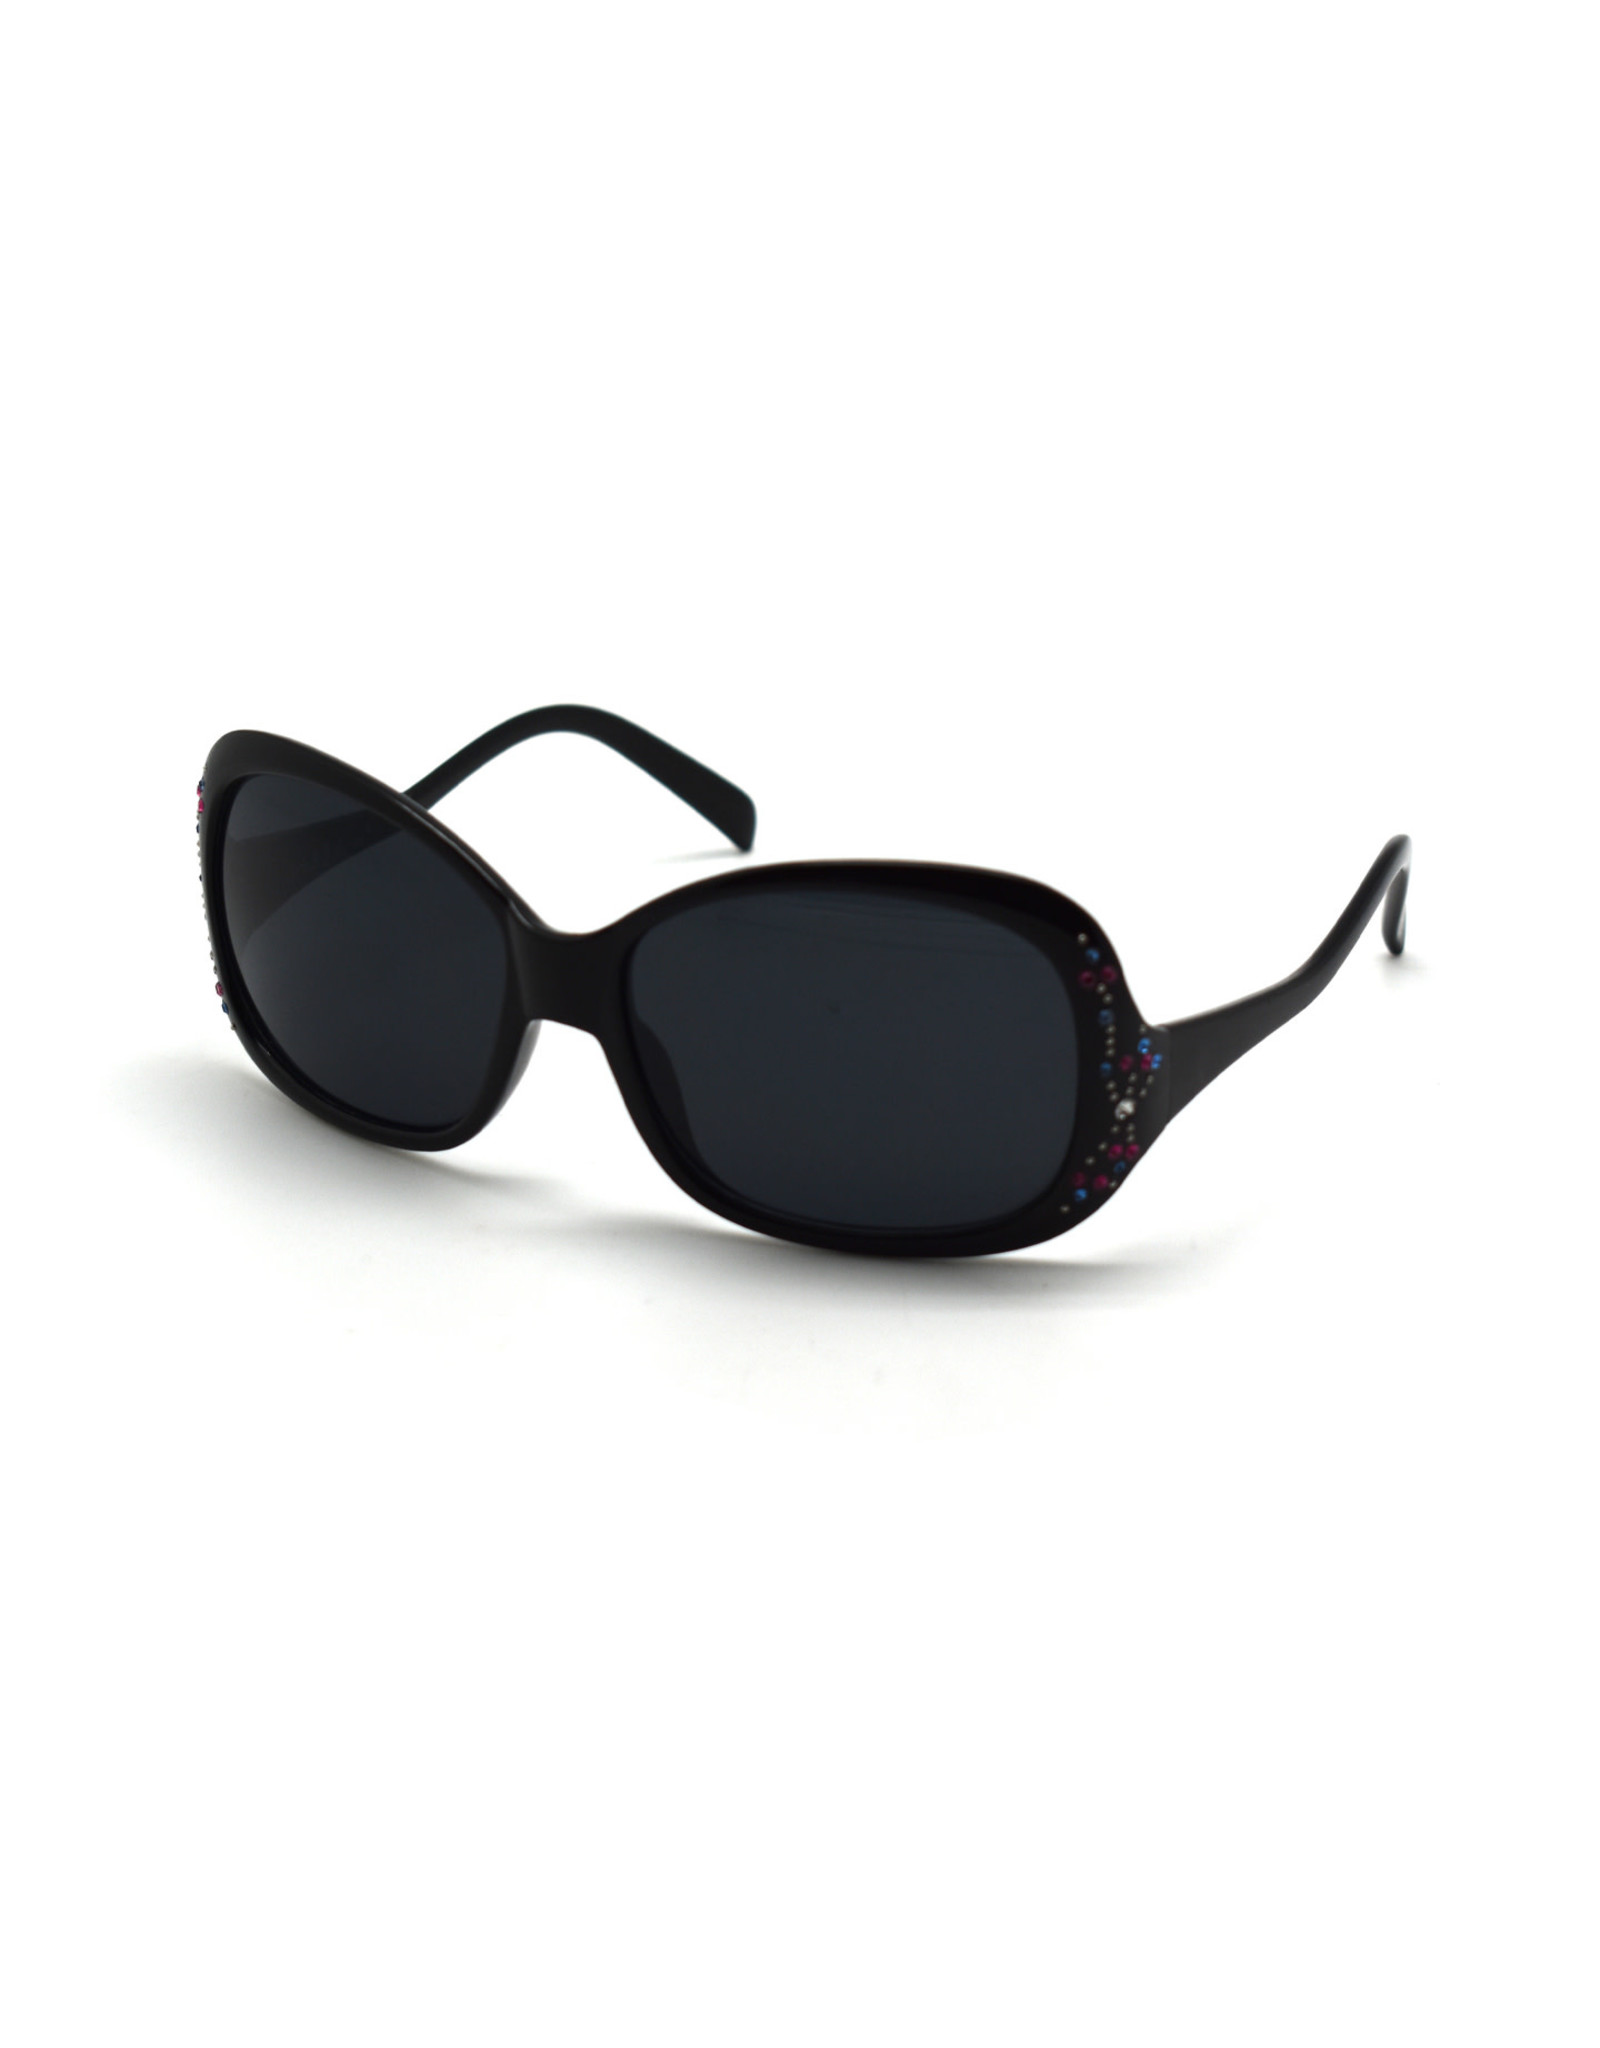 Barbara Sunglasses